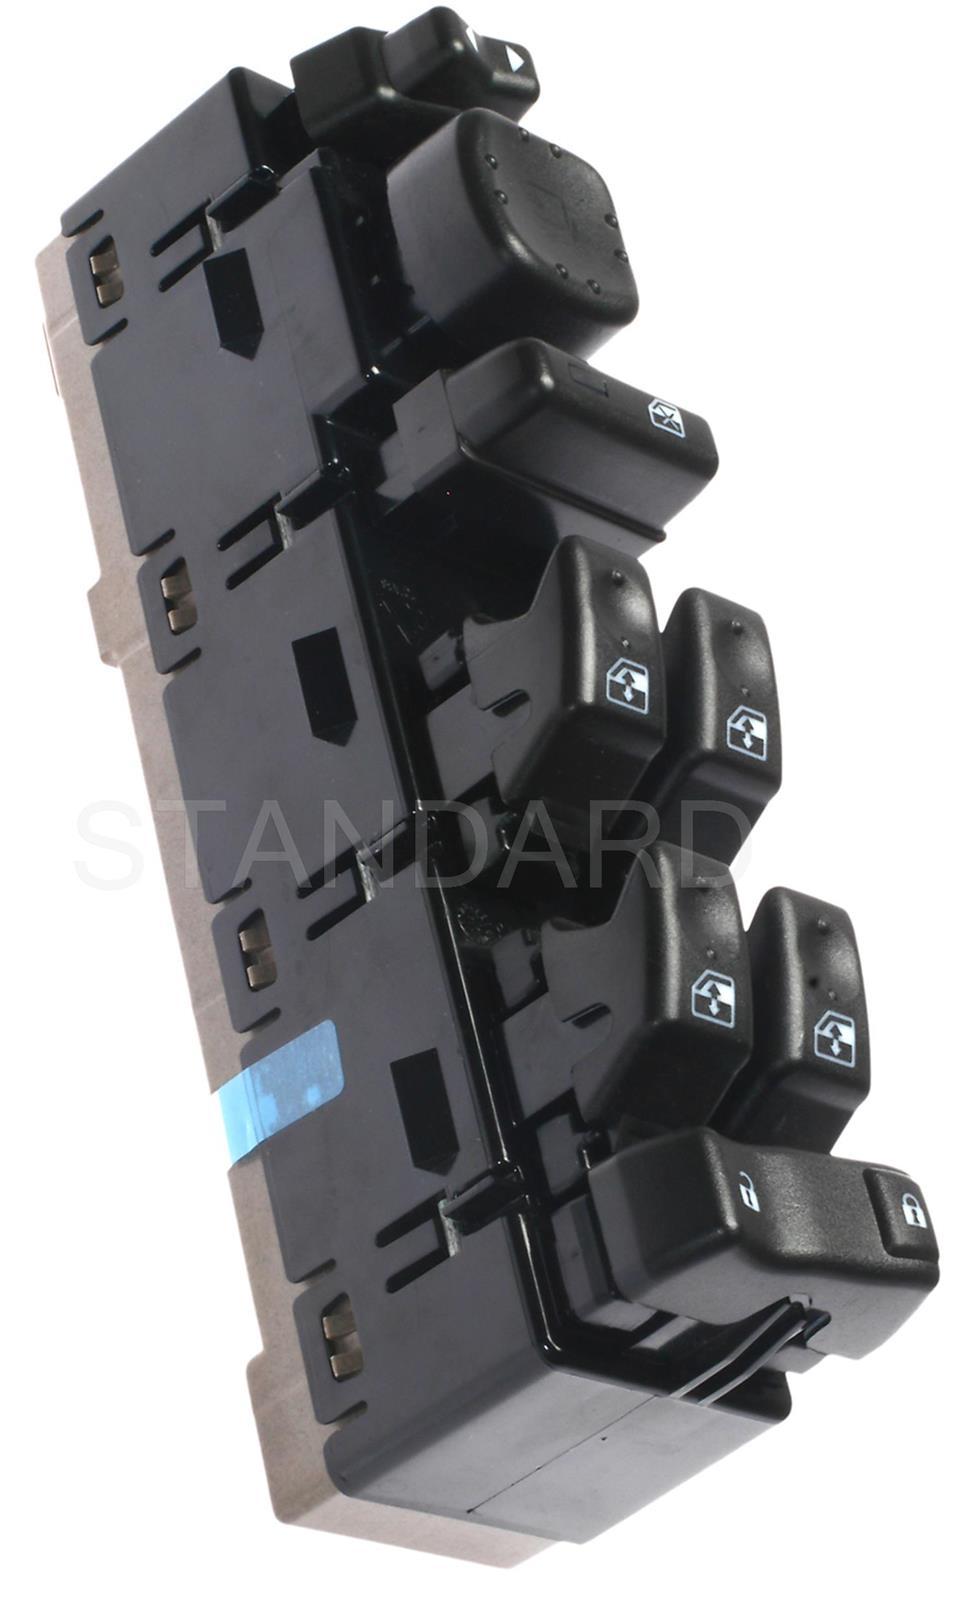 Standard Motor Products DWS-1114 Power Window Switch